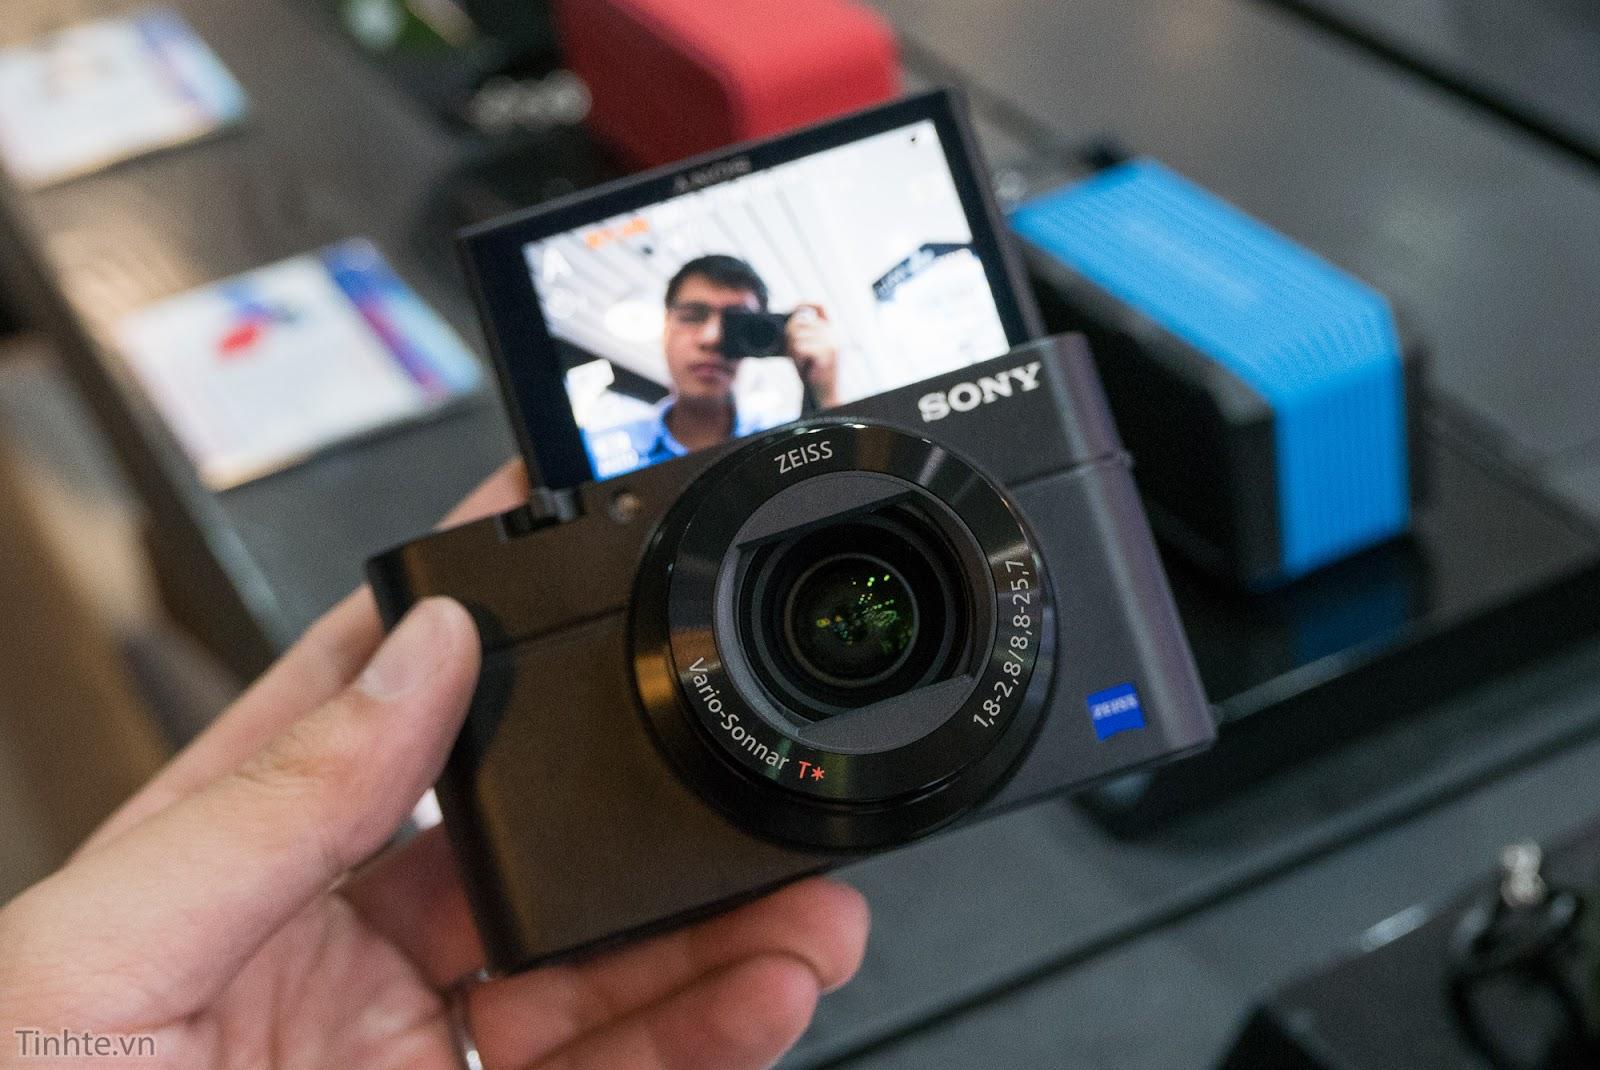 Tinhte.vn_Sony_RX100_mark_IV_4-19.